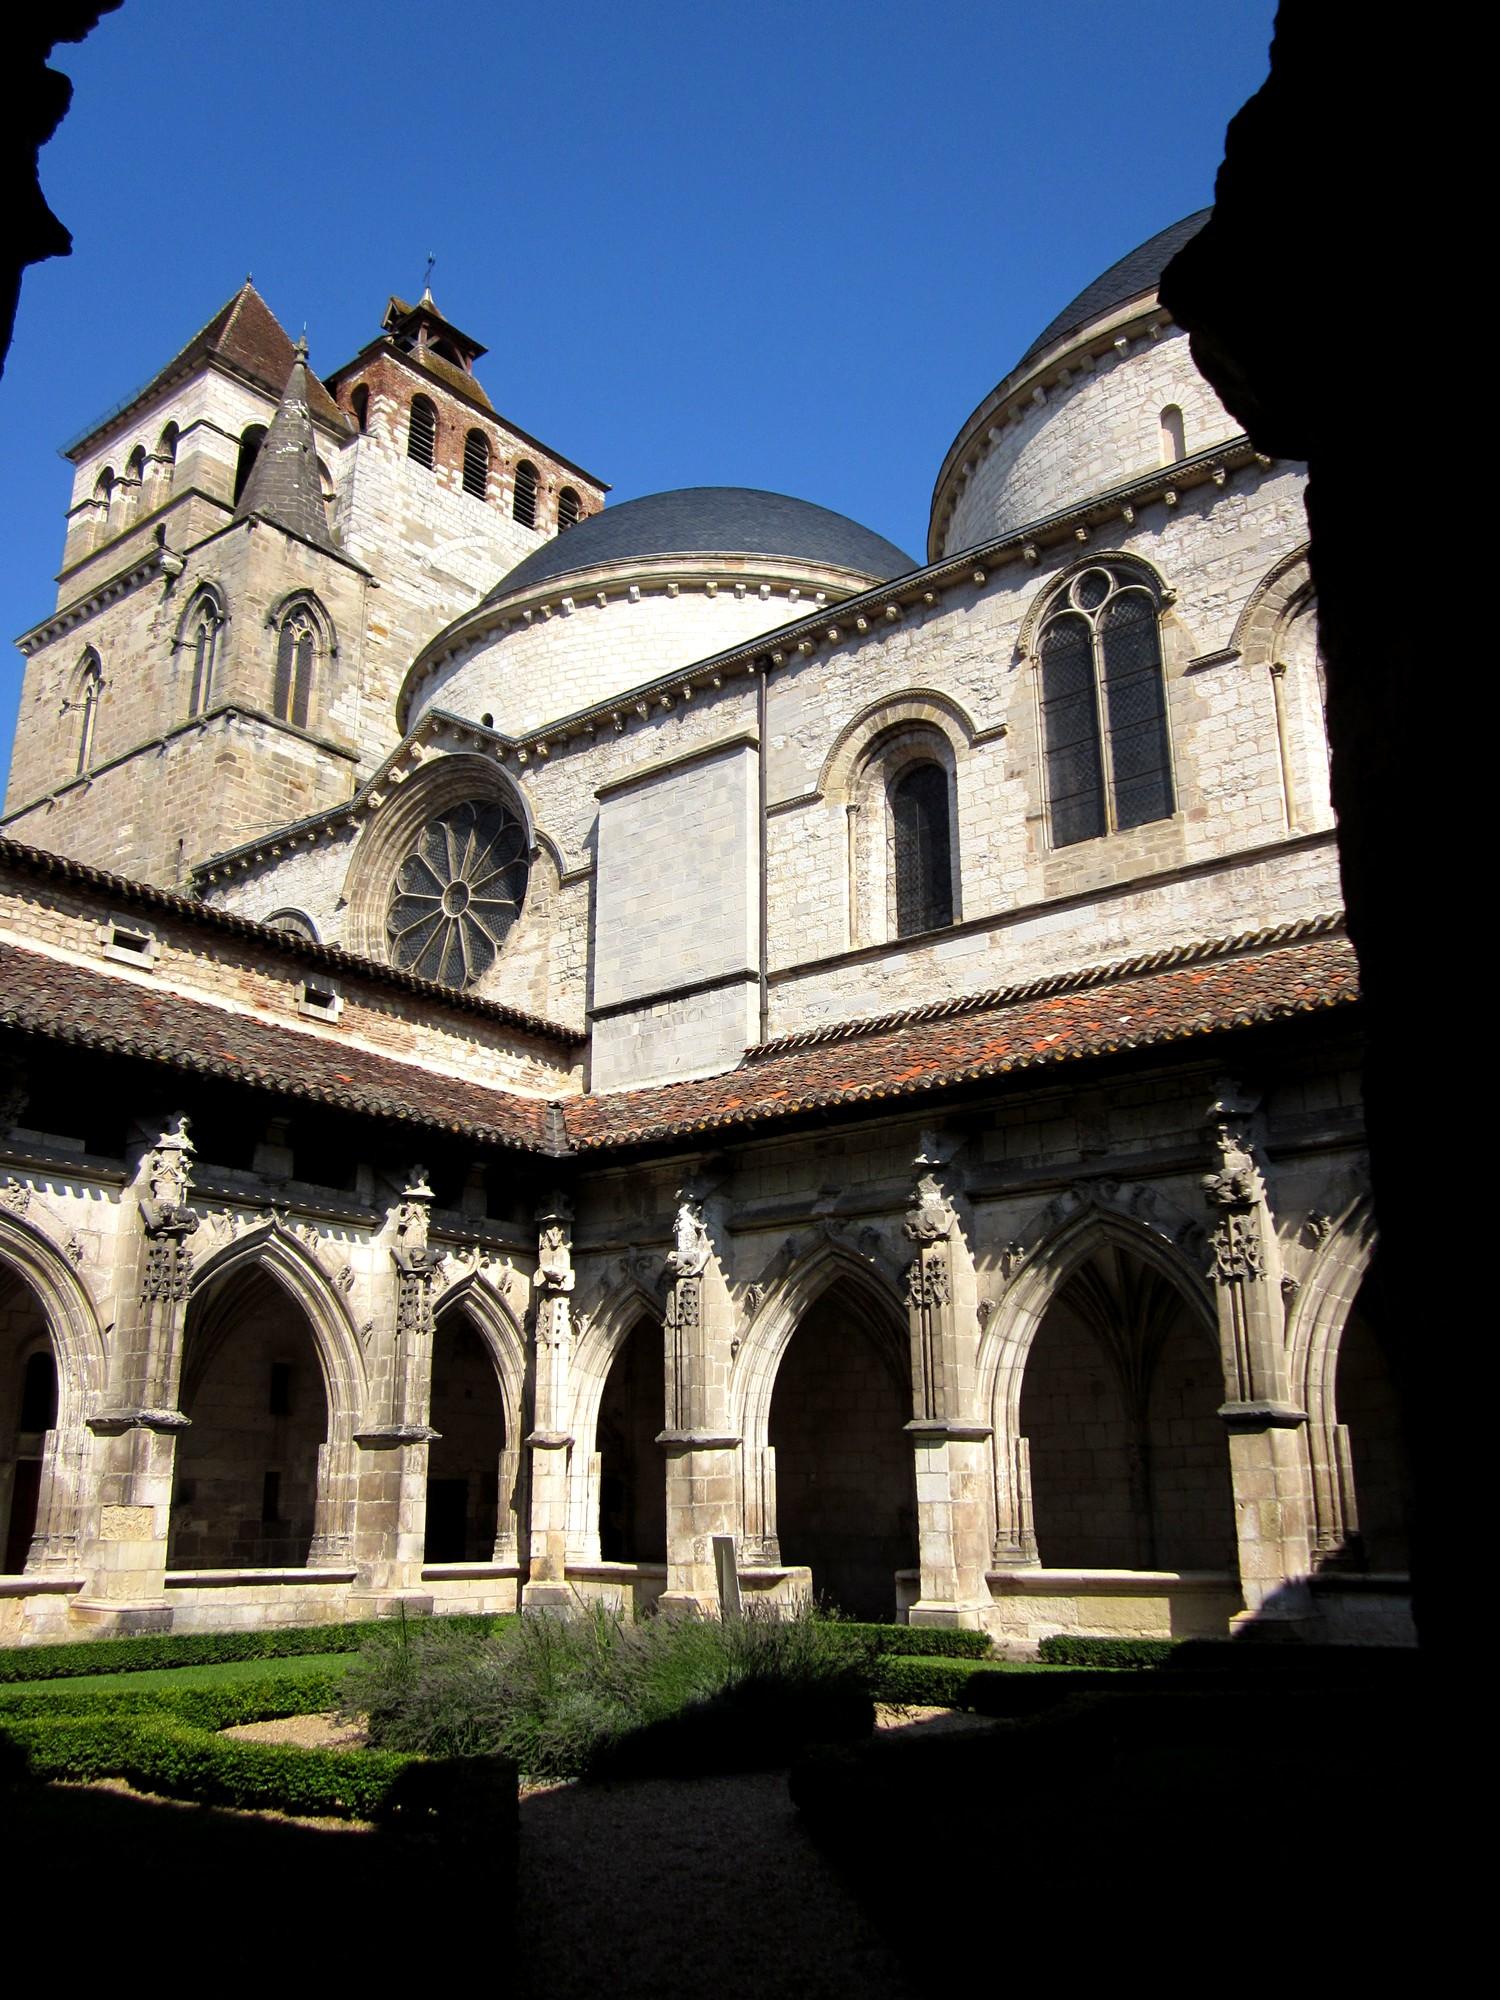 20 vers cahors 21 5 km via arverna - Cathedrale saint etienne de cahors ...